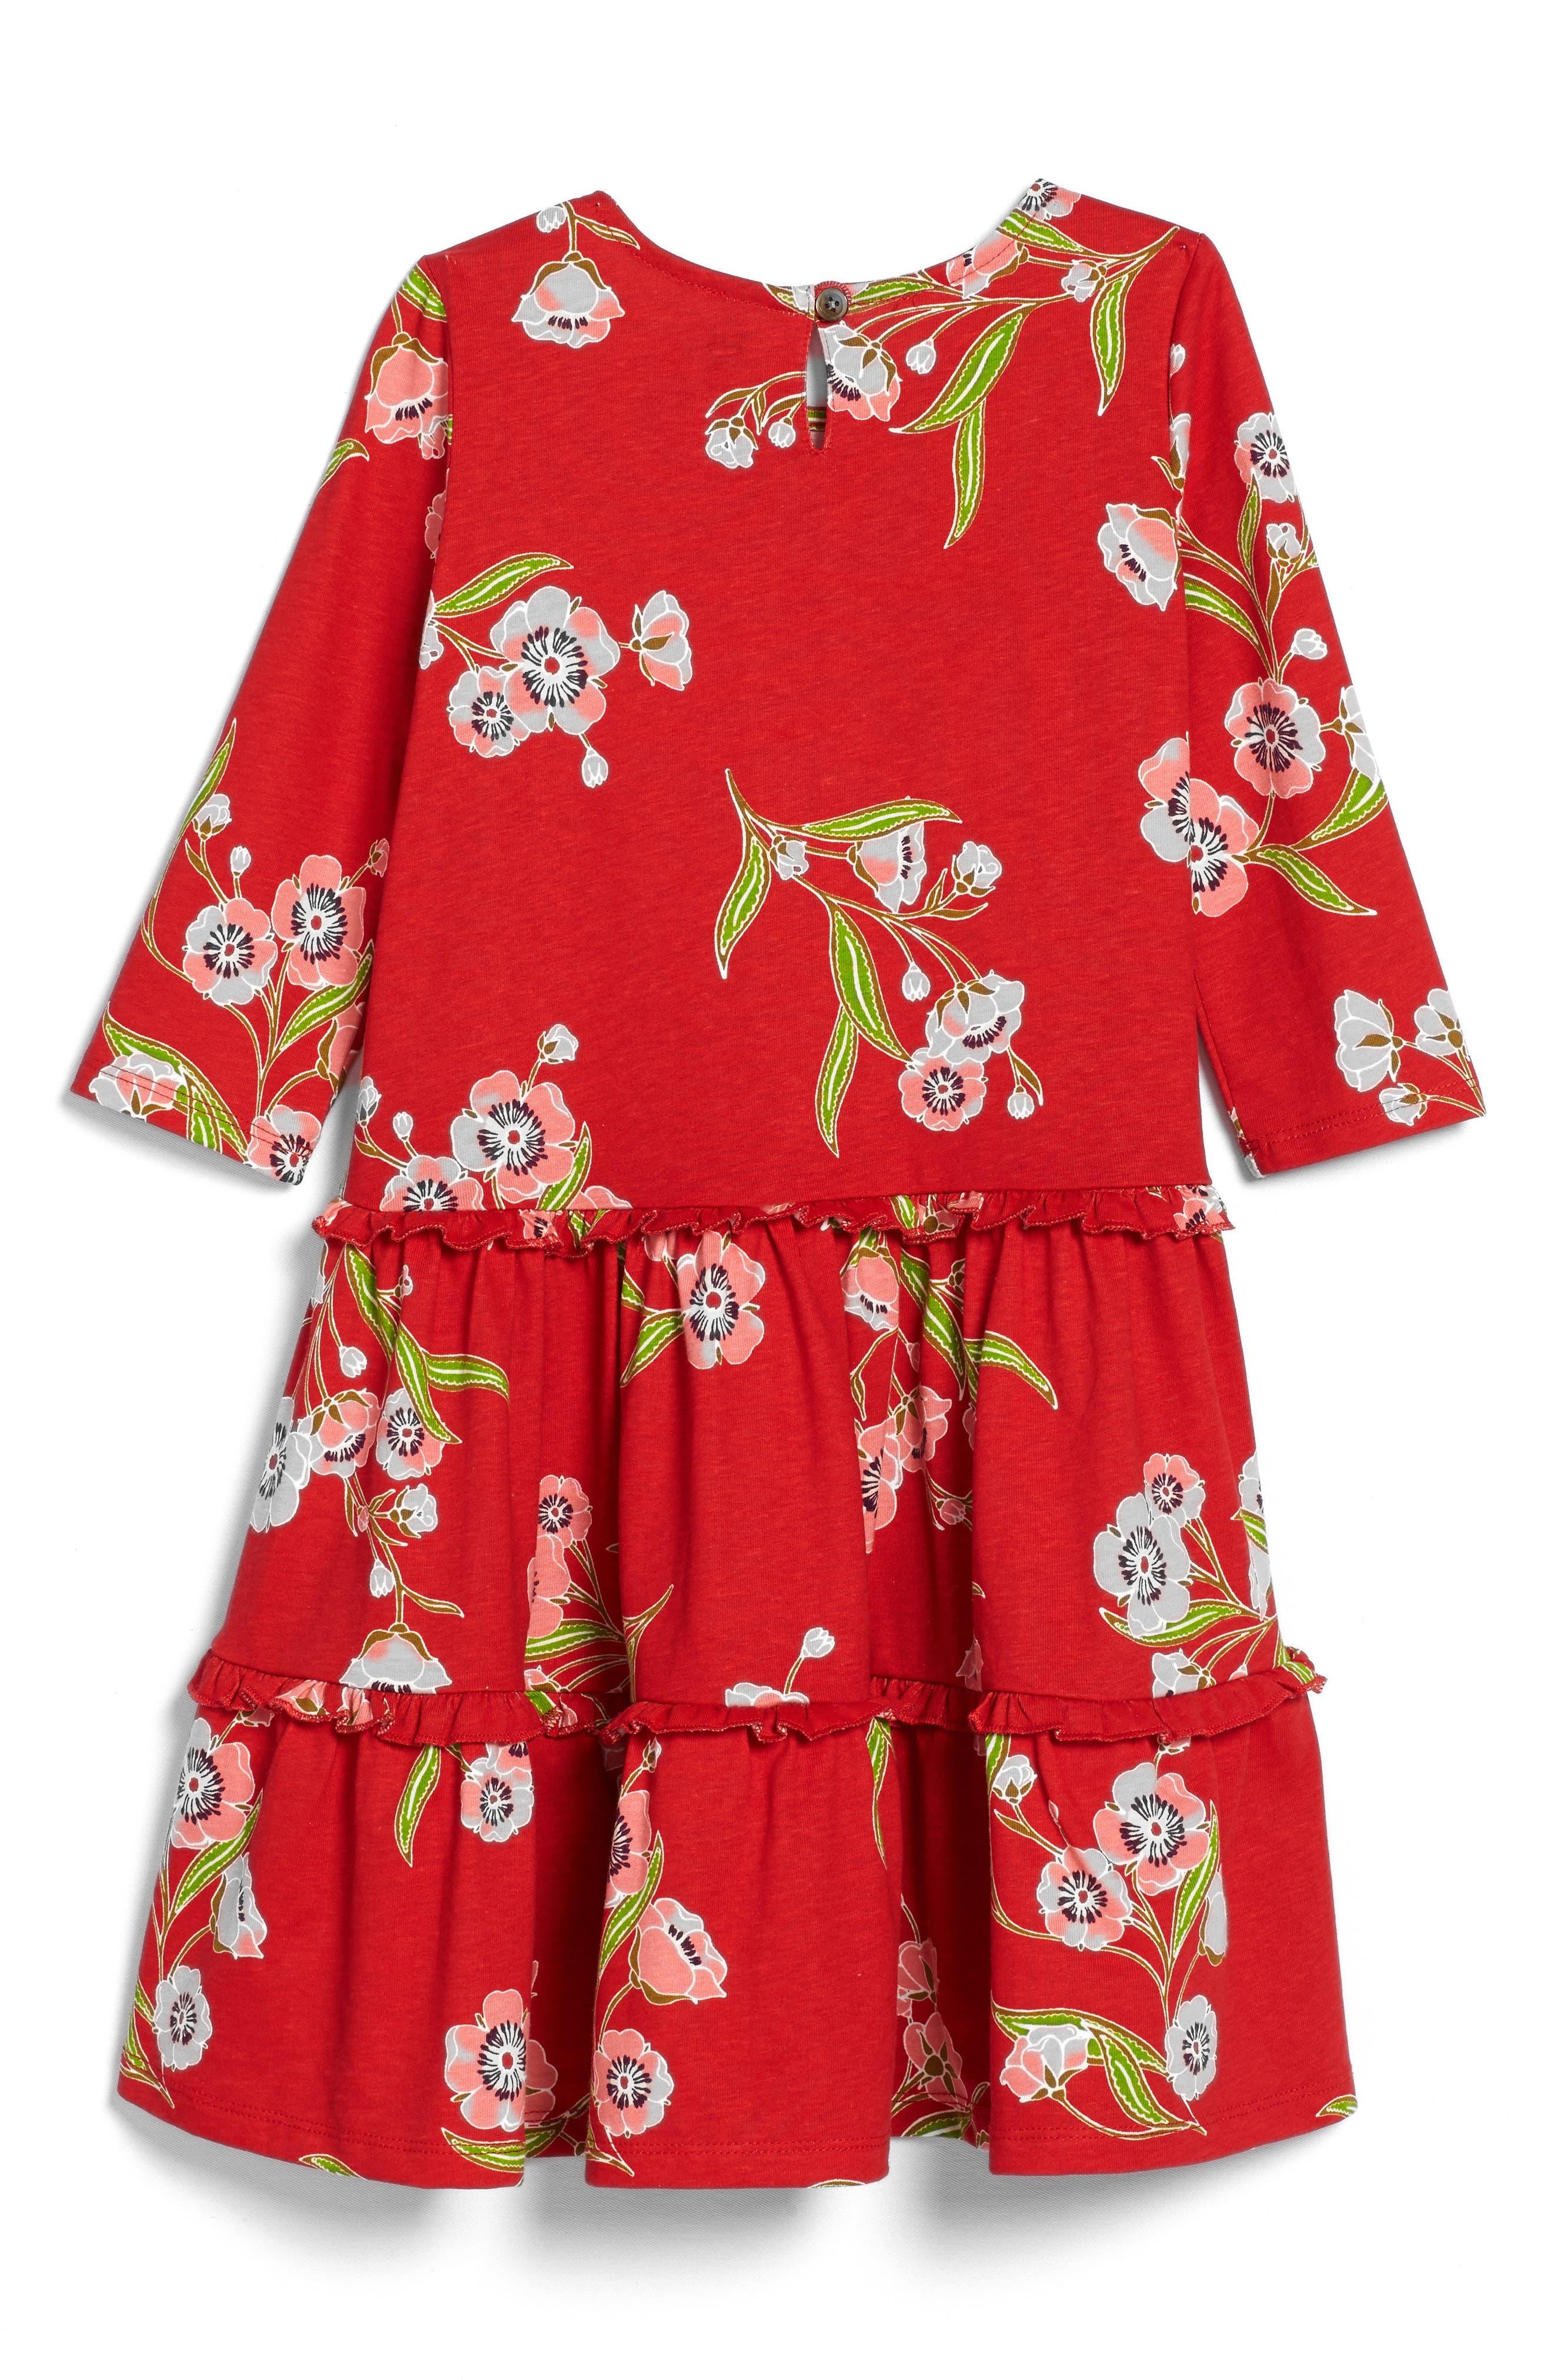 Rowan Floral Print Tiered Dress,                             Alternate thumbnail 2, color,                             615